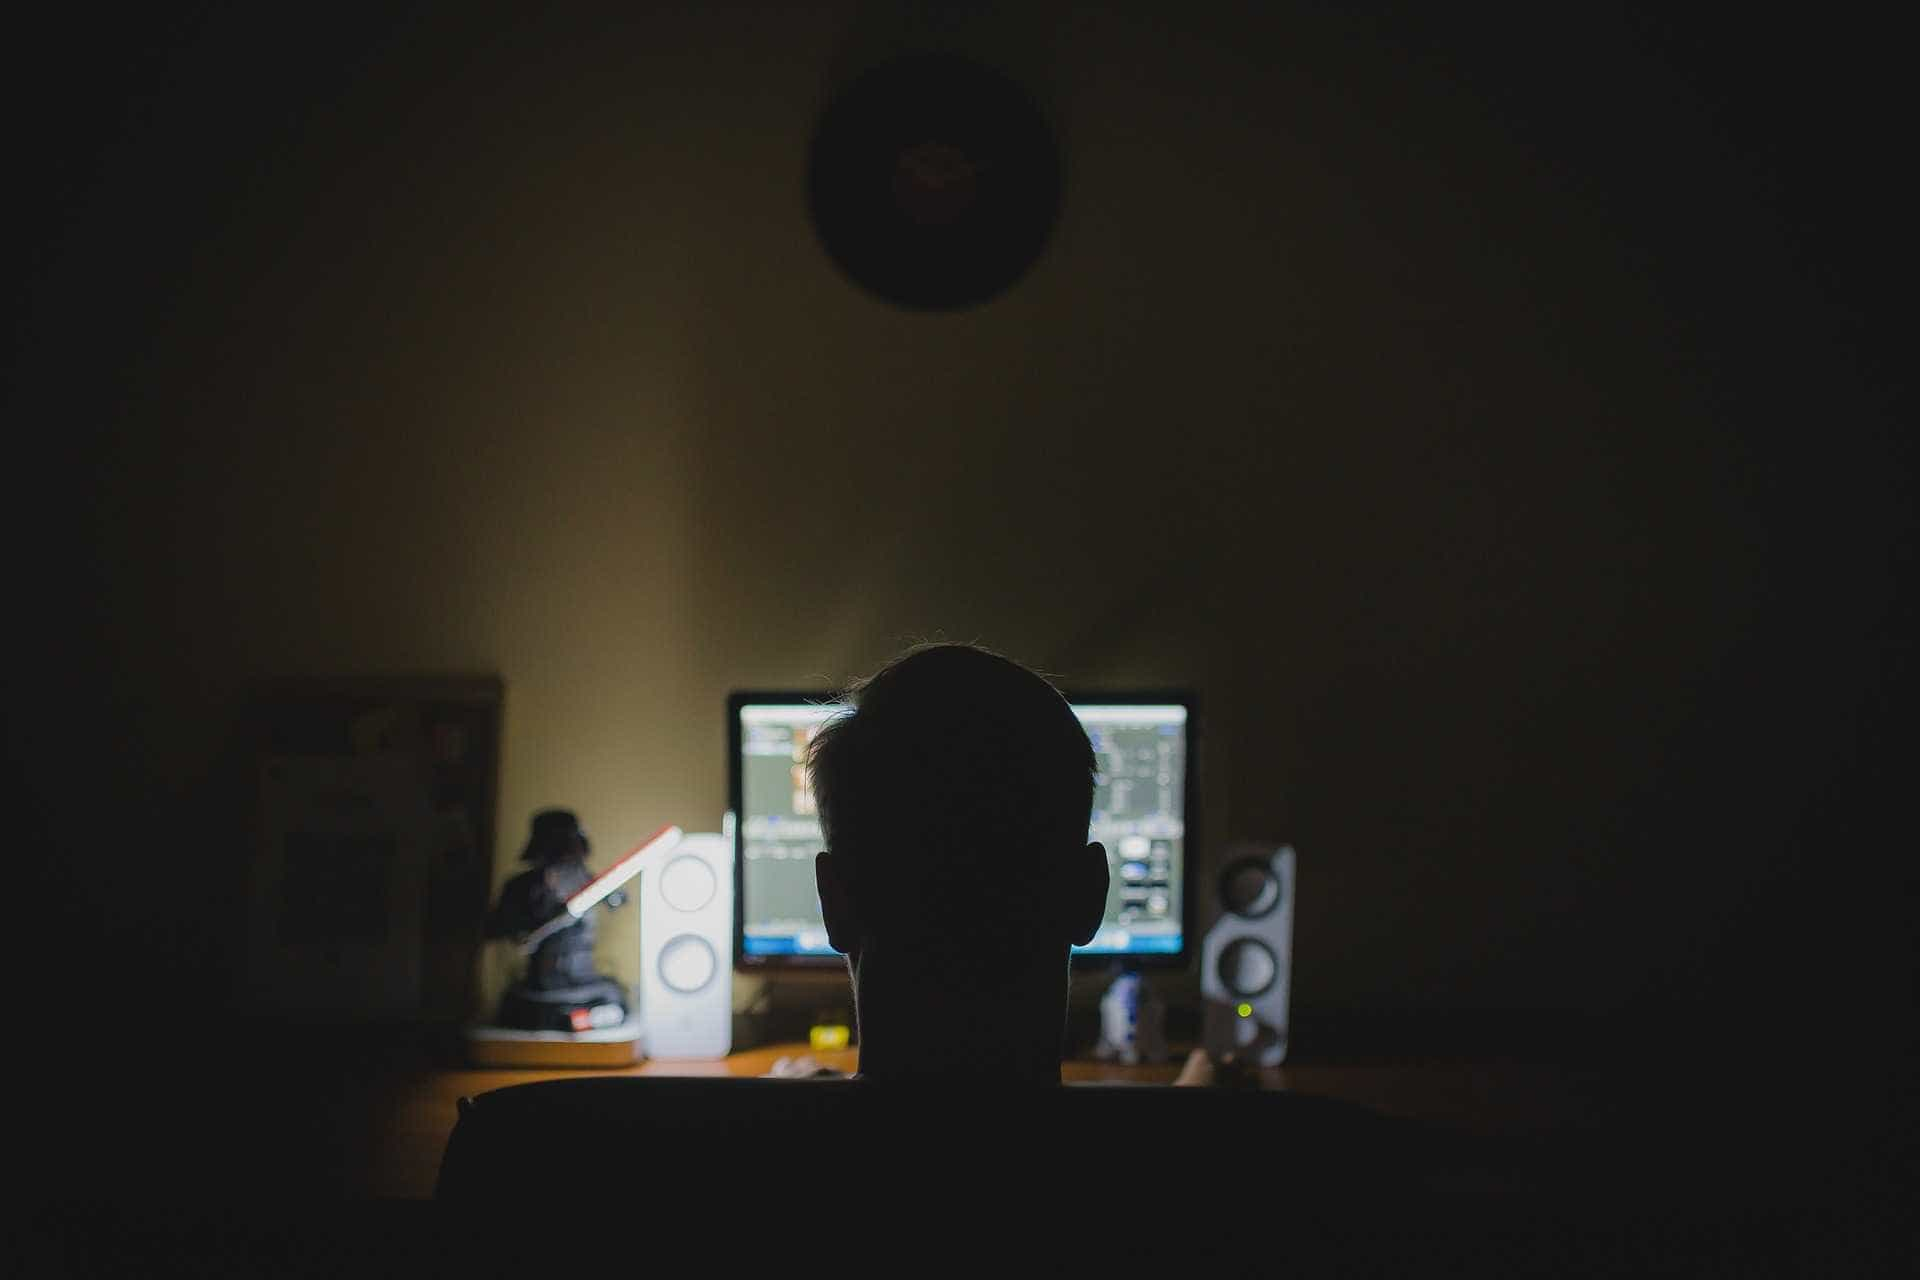 Suspeito de estupro virtual ameaçava divulgar 'nudes' da vítima